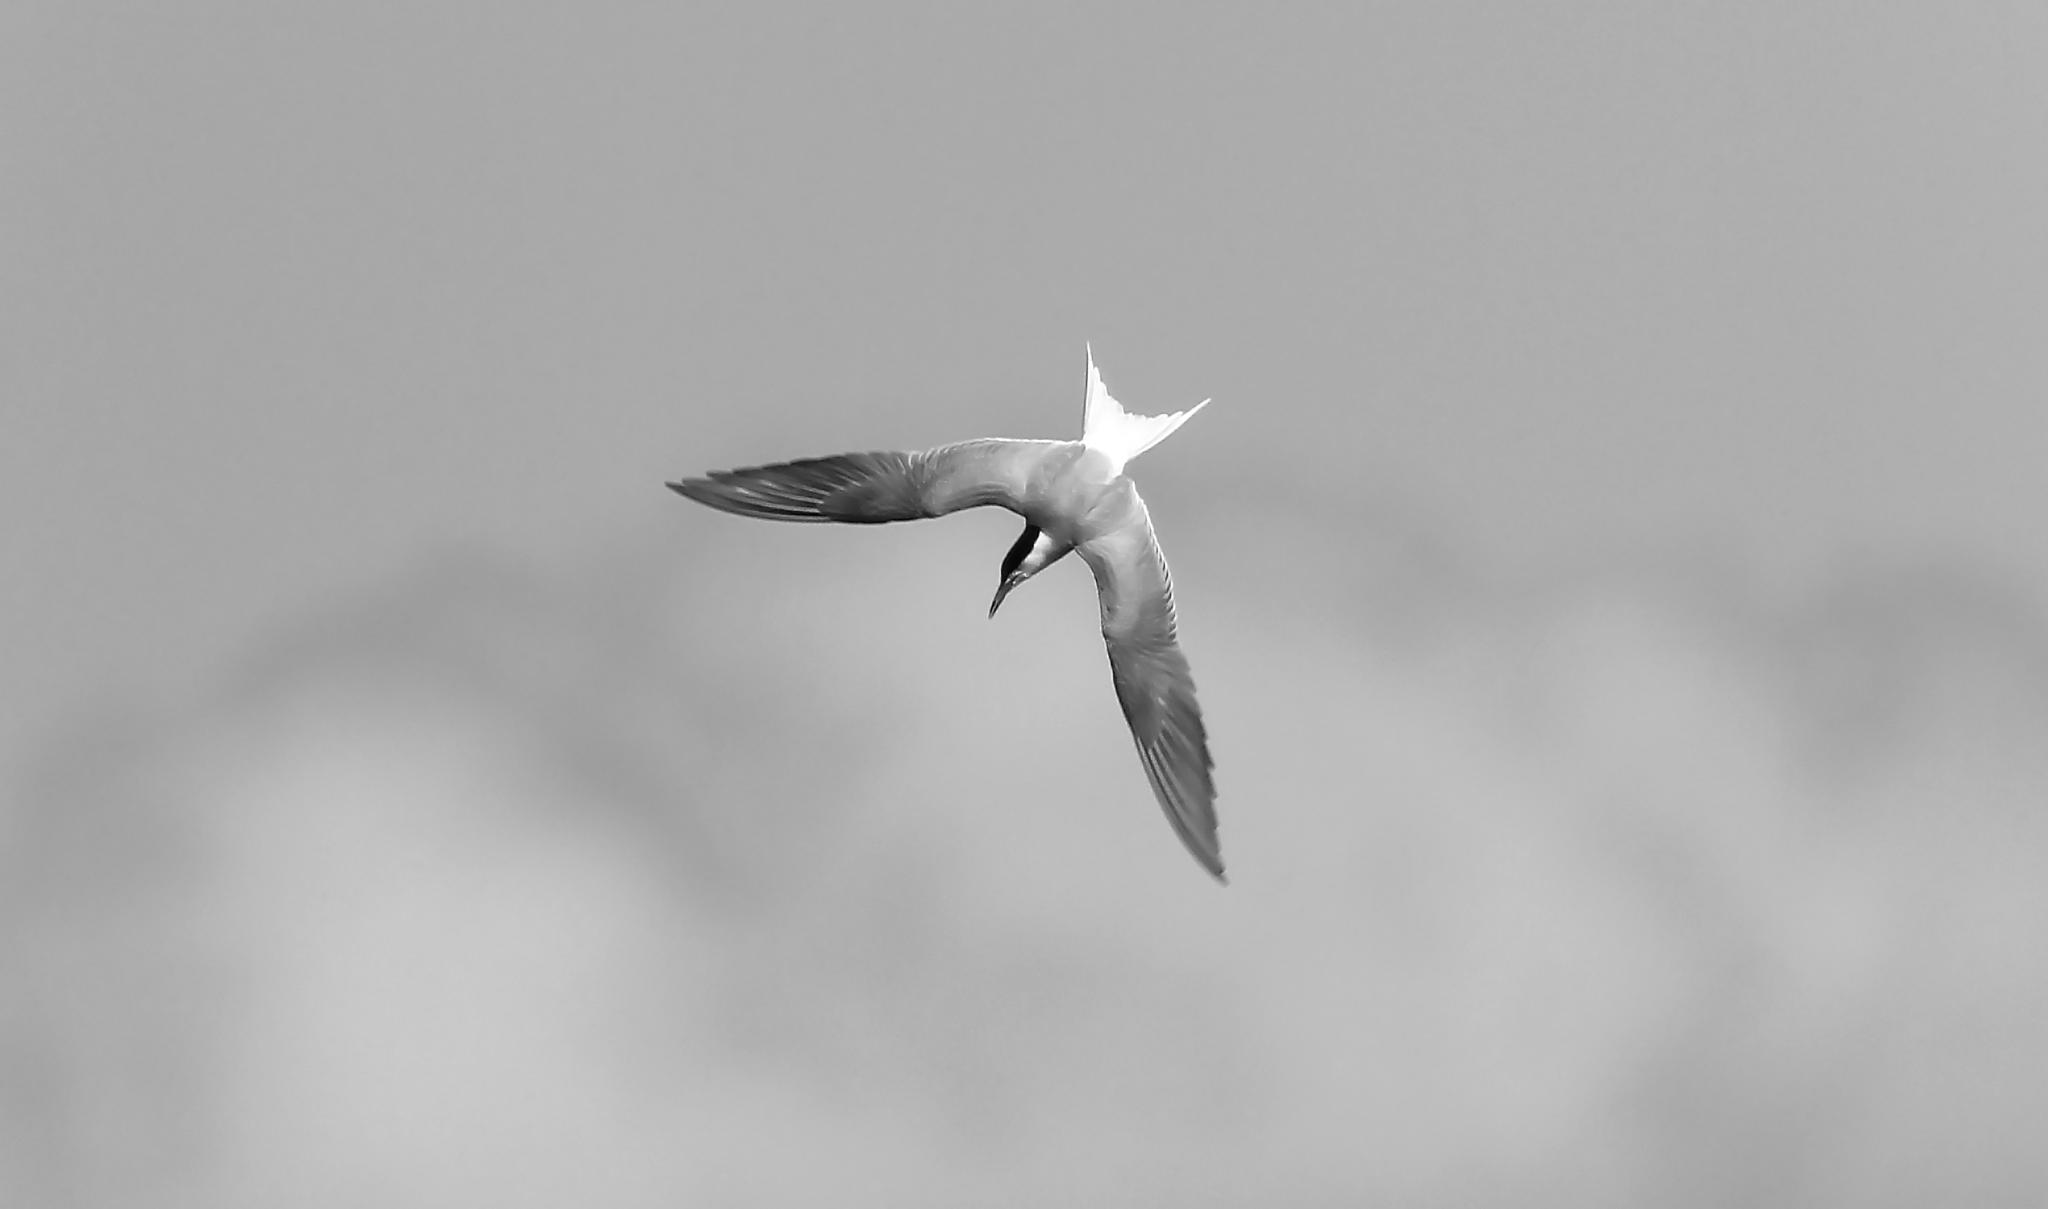 A diving tern by SRFOTO